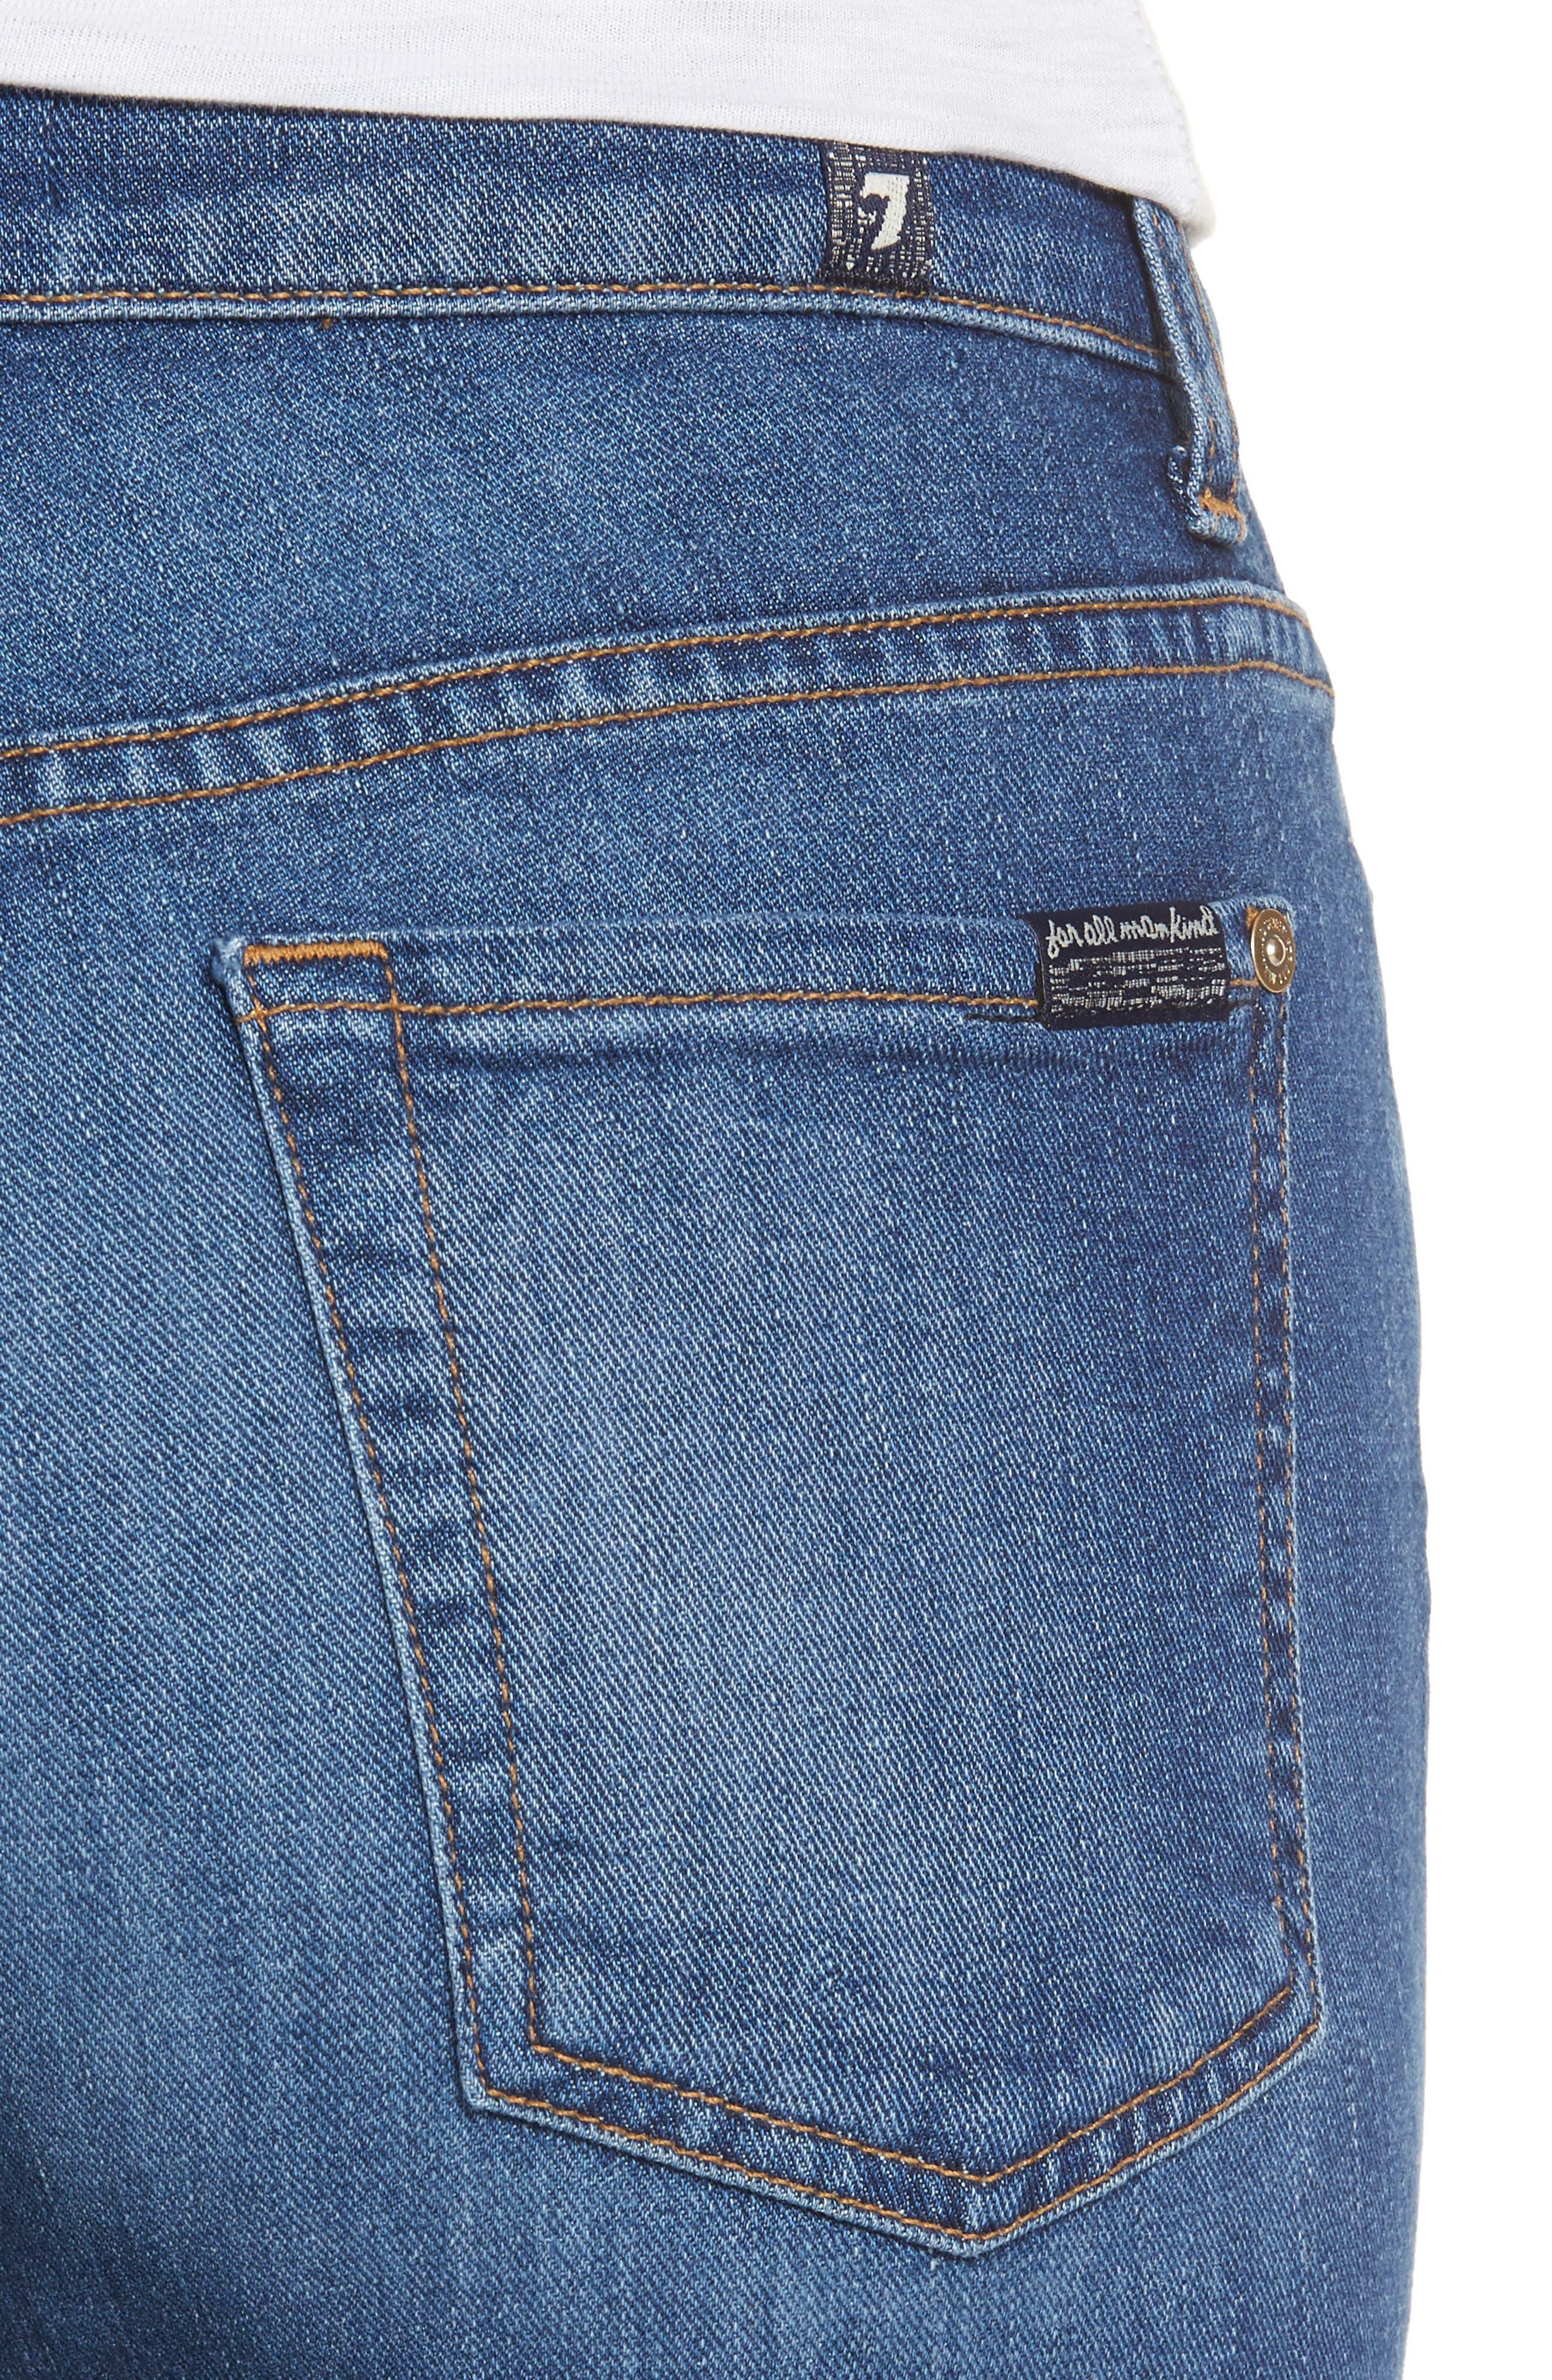 7 FOR ALL MANKIND<SUP>®</SUP>, Ali Split Hem Crop Flare Jeans, Alternate thumbnail 4, color, 401